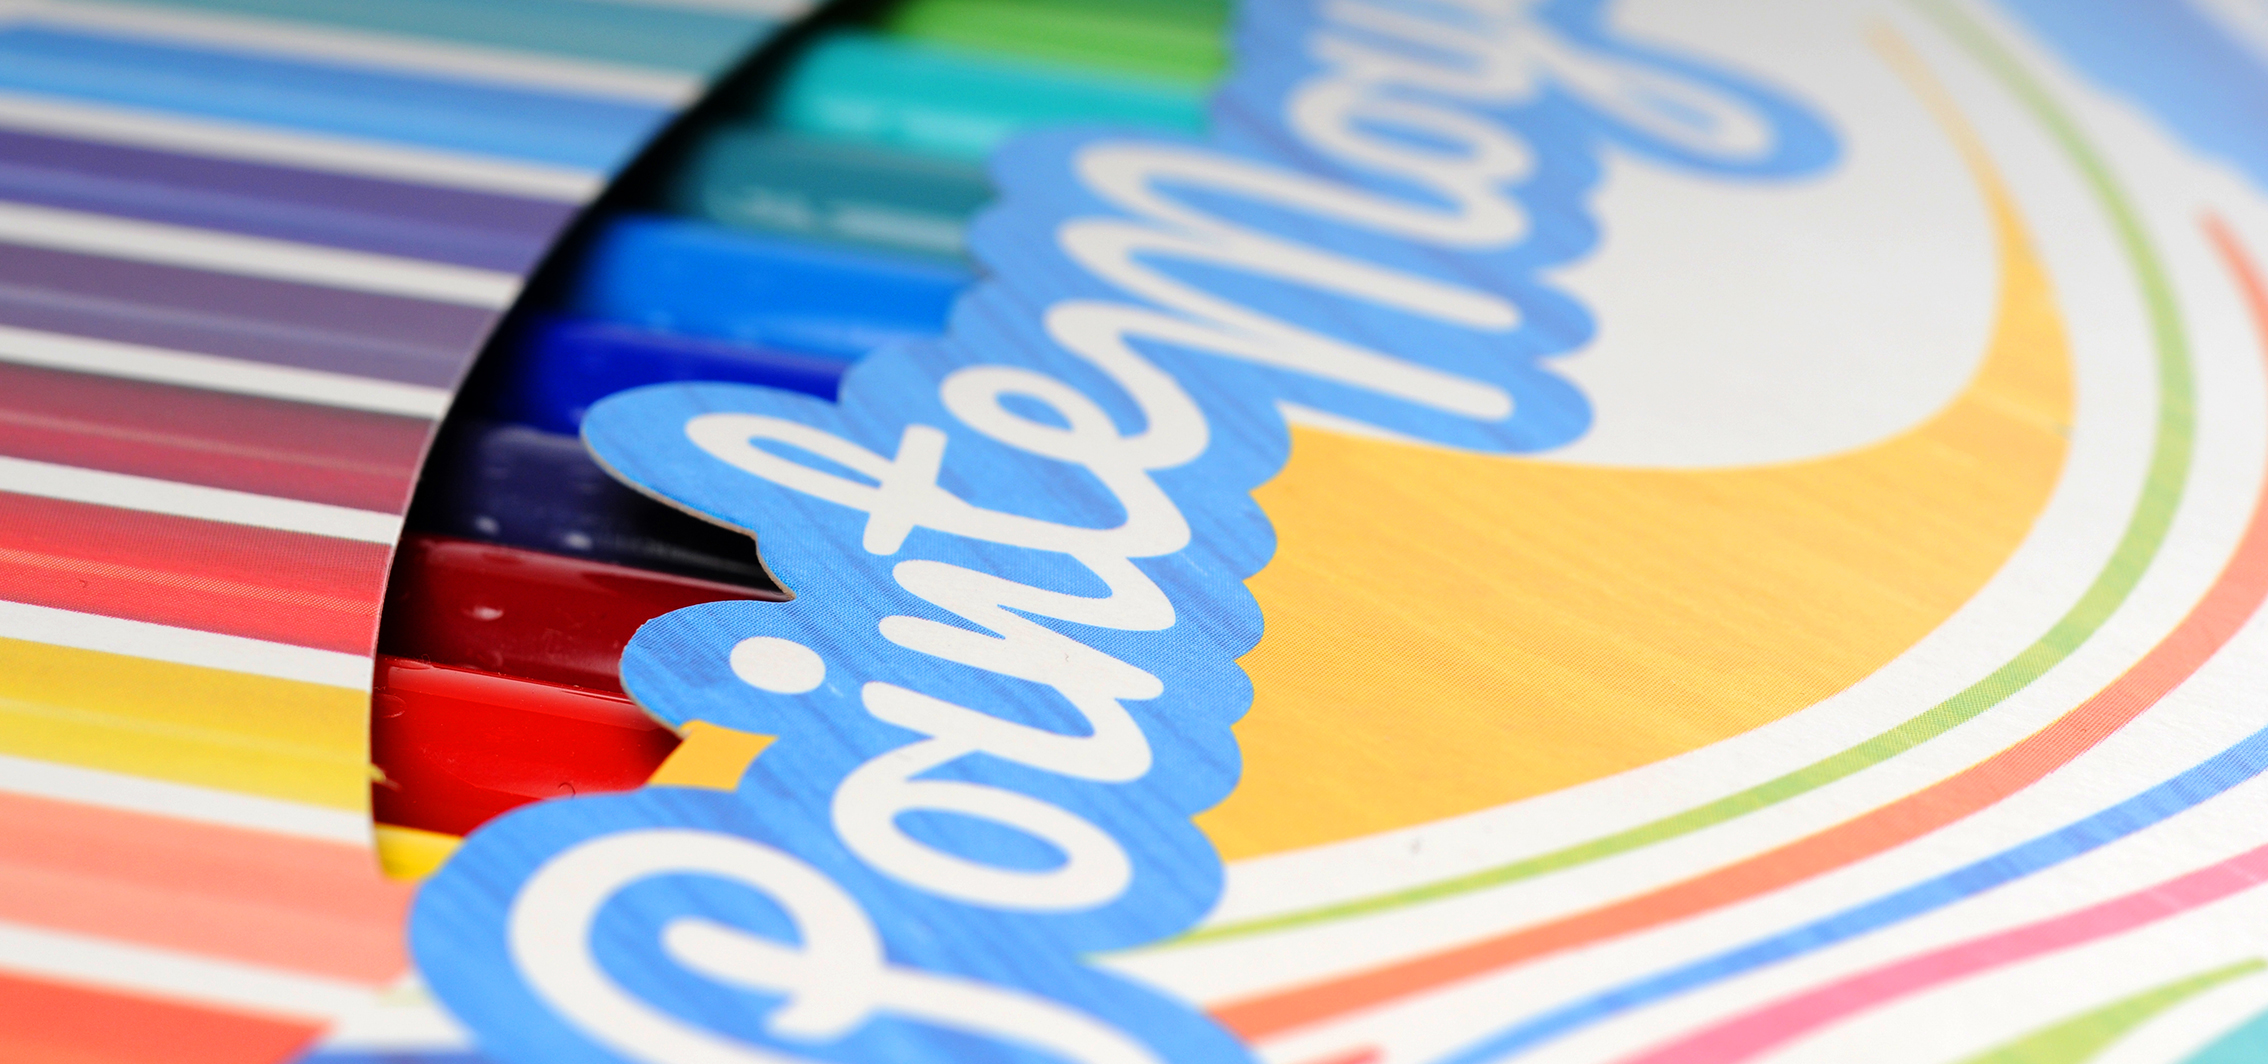 systeme u identité packaging papeterie ecriture